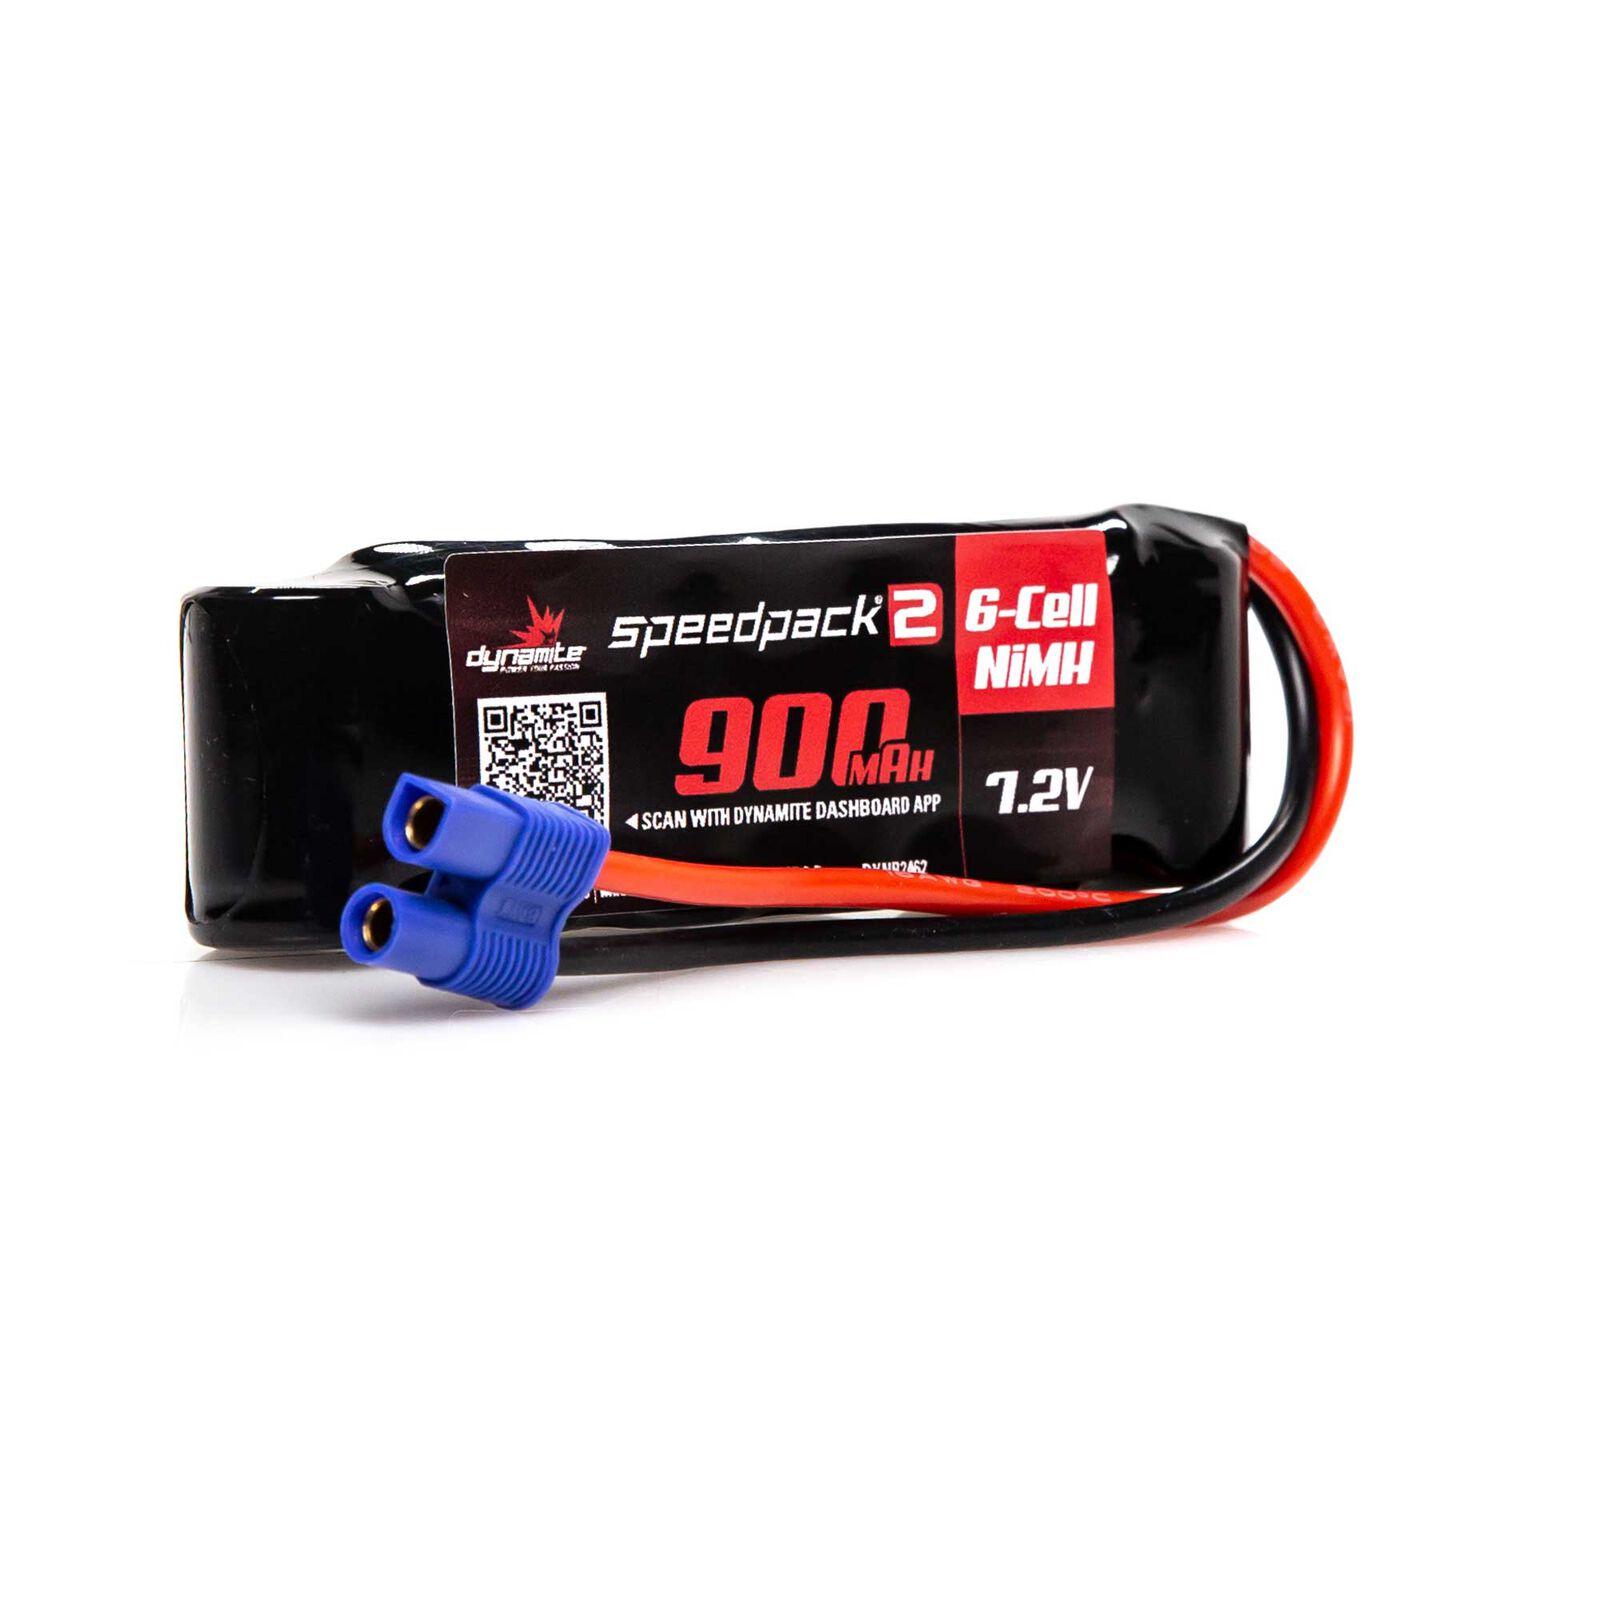 Speedpack2 7.2V 900mAh 6C NiMH, EC3